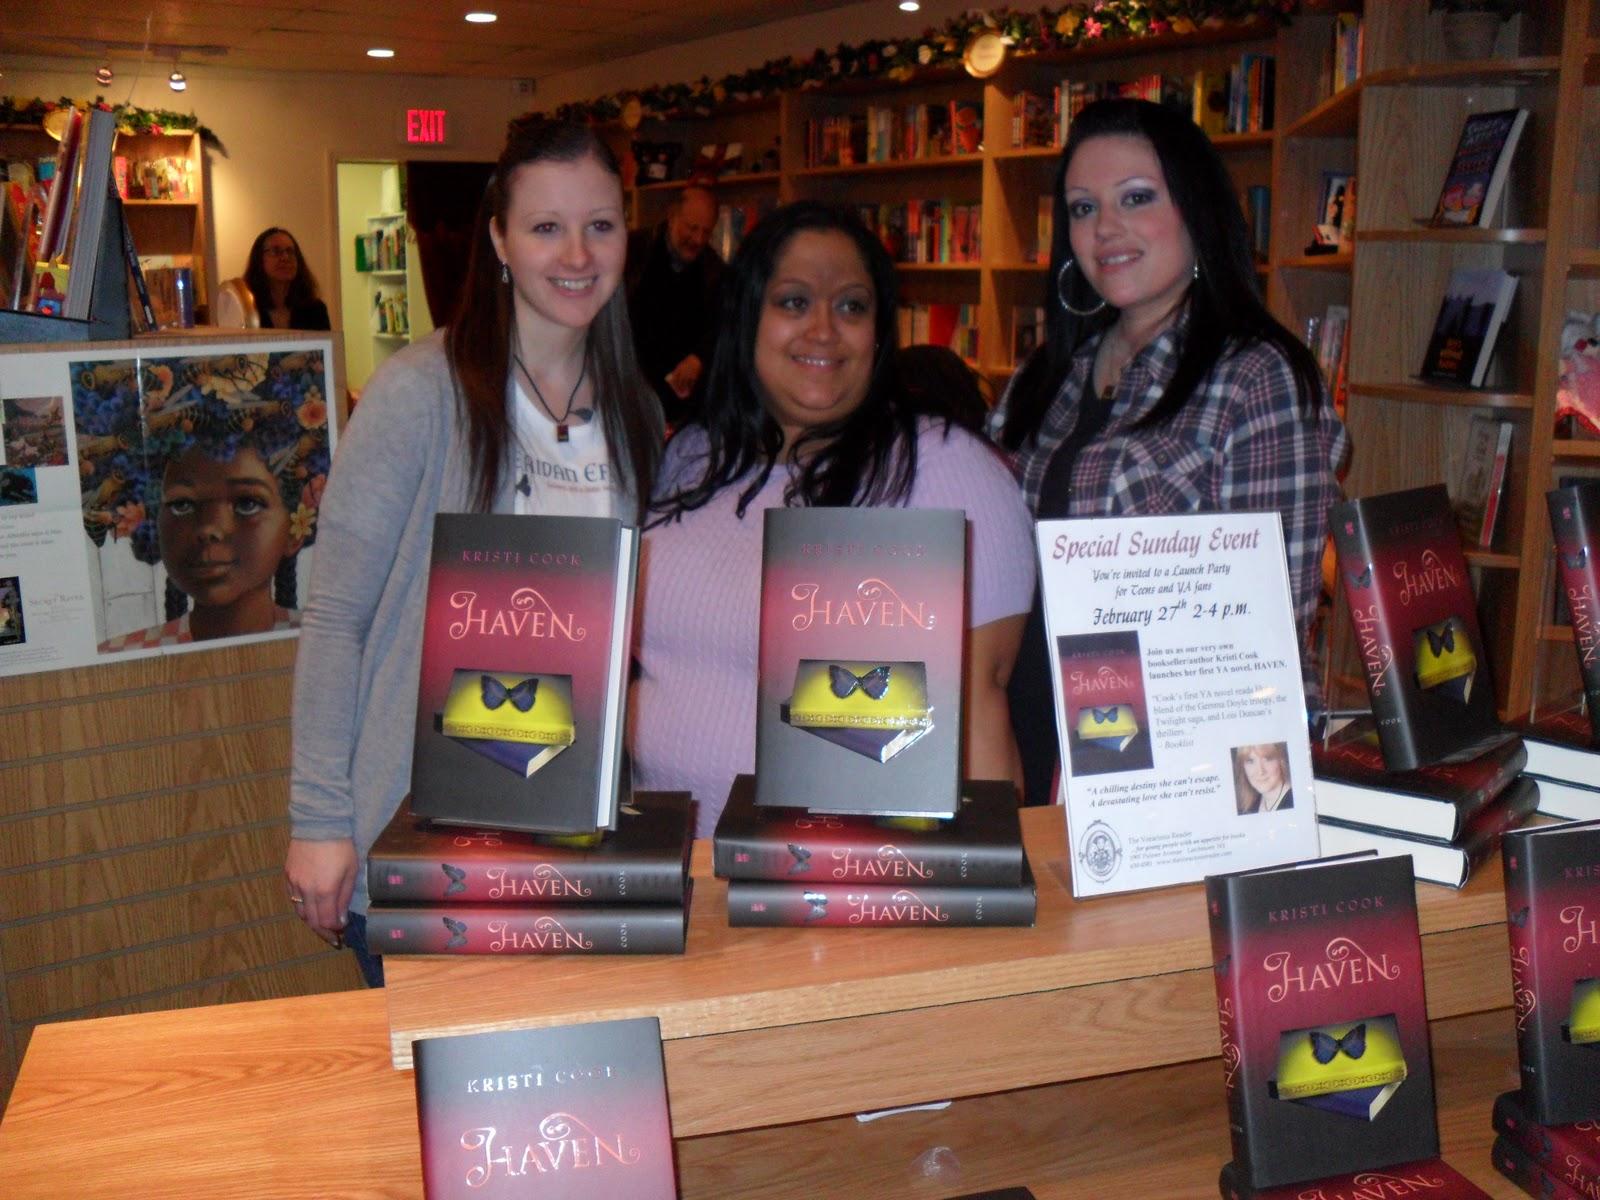 Lisa, Wanda, Kristi Cook and Dee